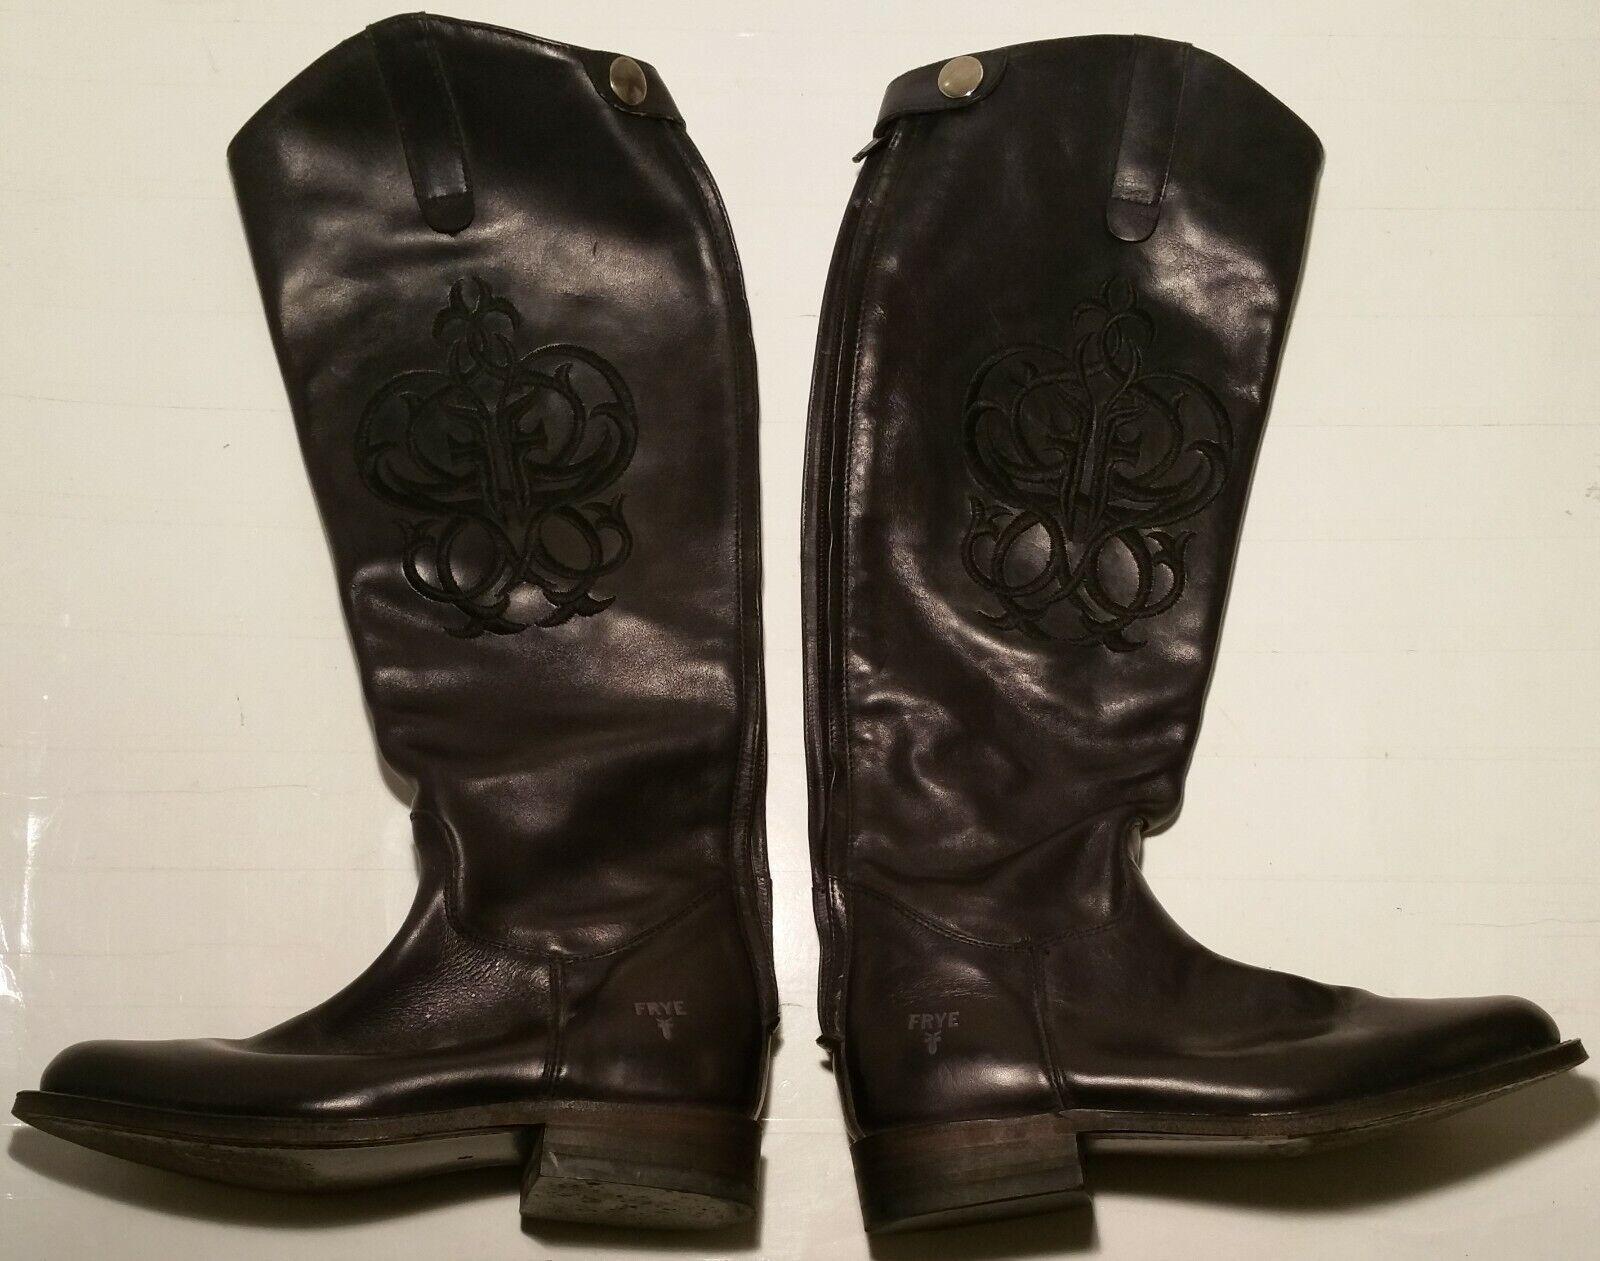 Frye Lindsay logotipo para mujer 6 M De Cuero Negro botas De Montar a Caballo De Bordado